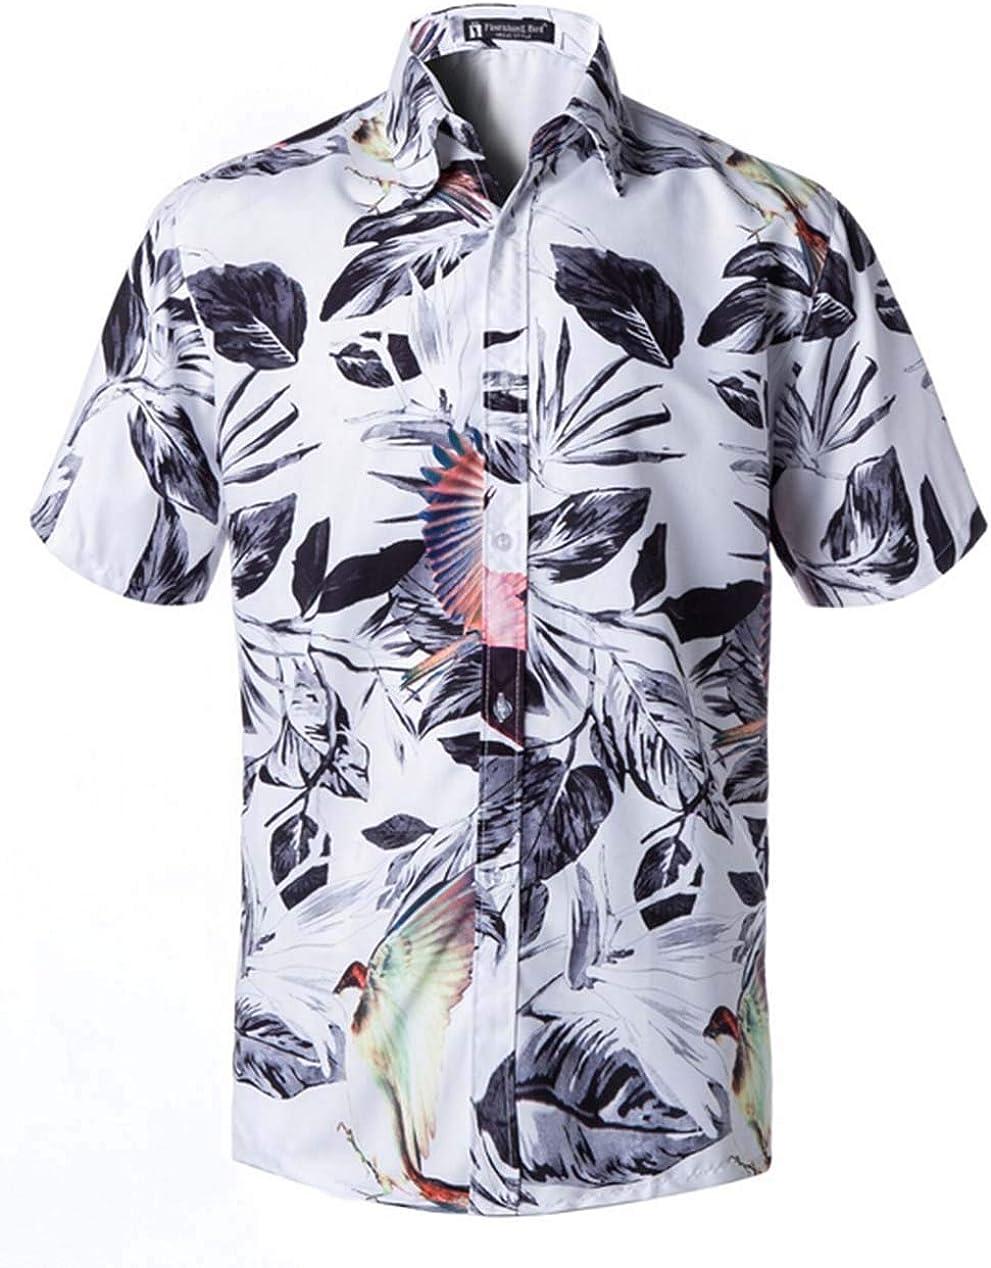 Guyay Mens Flower Shirt Short Sleeve Hawaiian Casual Button Down Beach Shirt